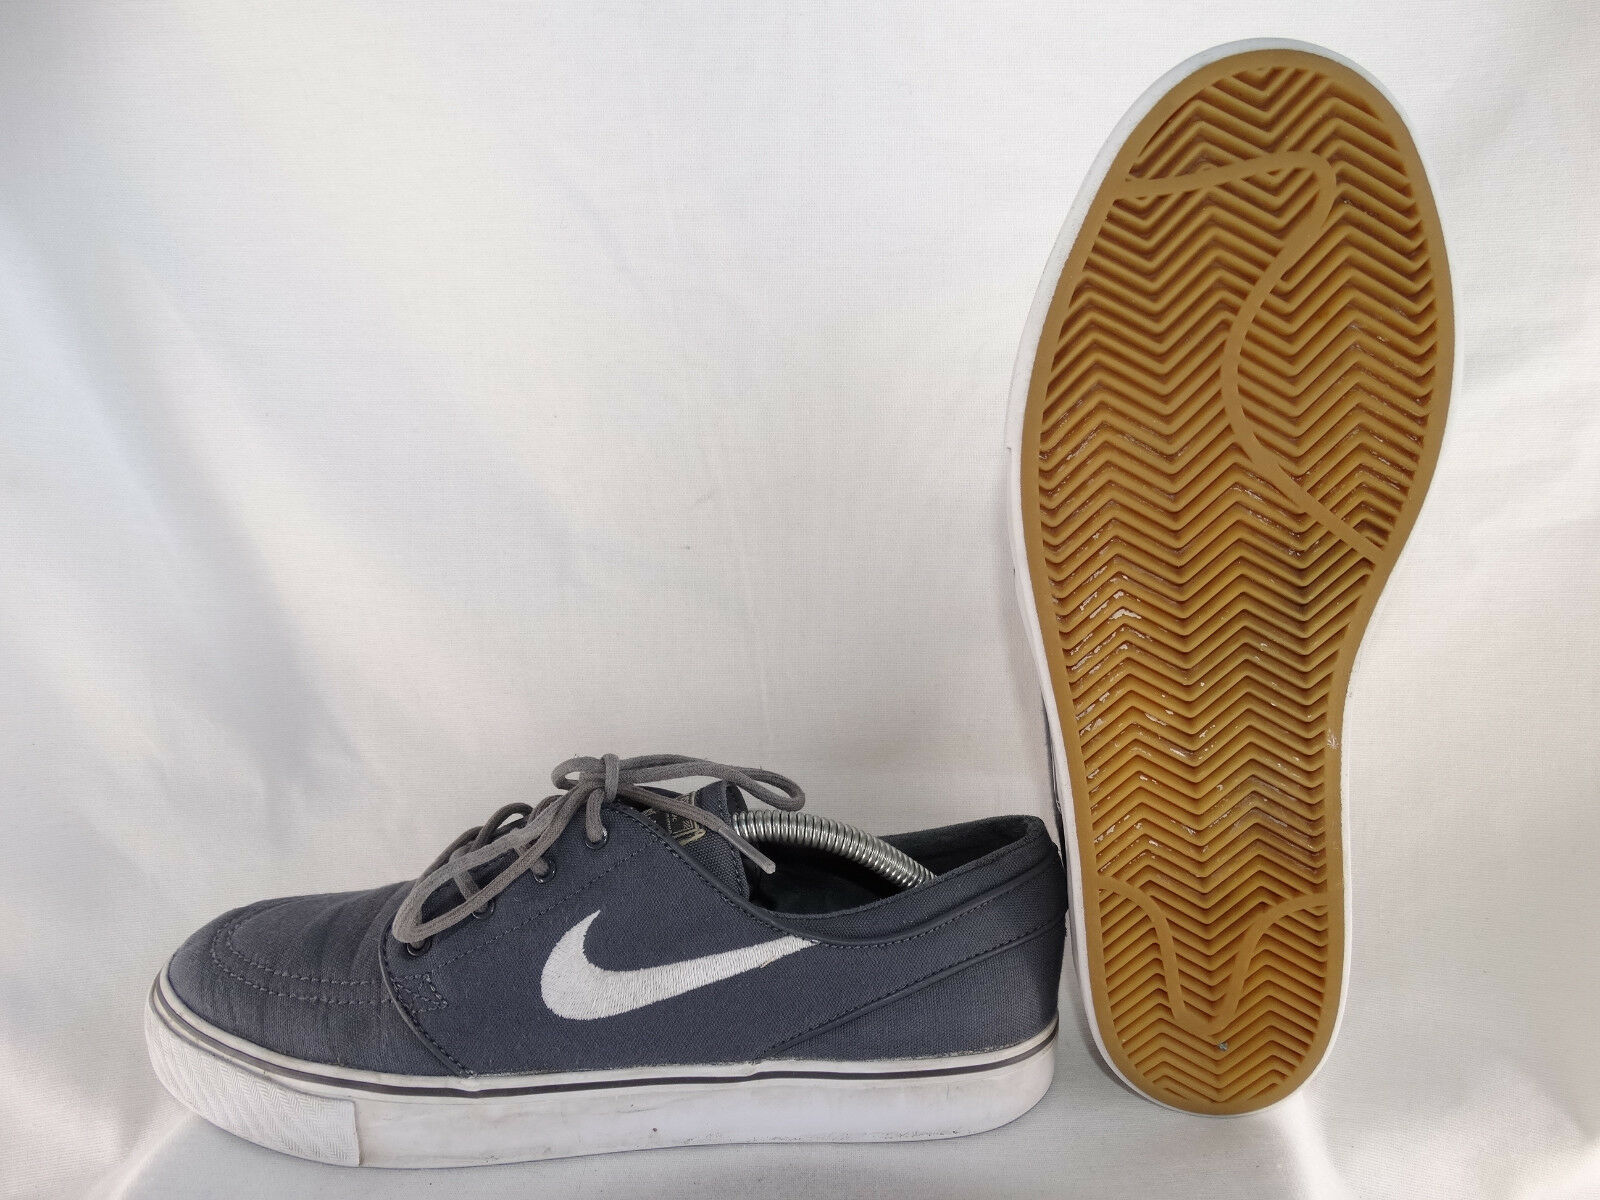 Nike SB Zoom Stefan Janoski Canvas Turnschuhe 615957-027 grau-weiß EU 42,5 US 9